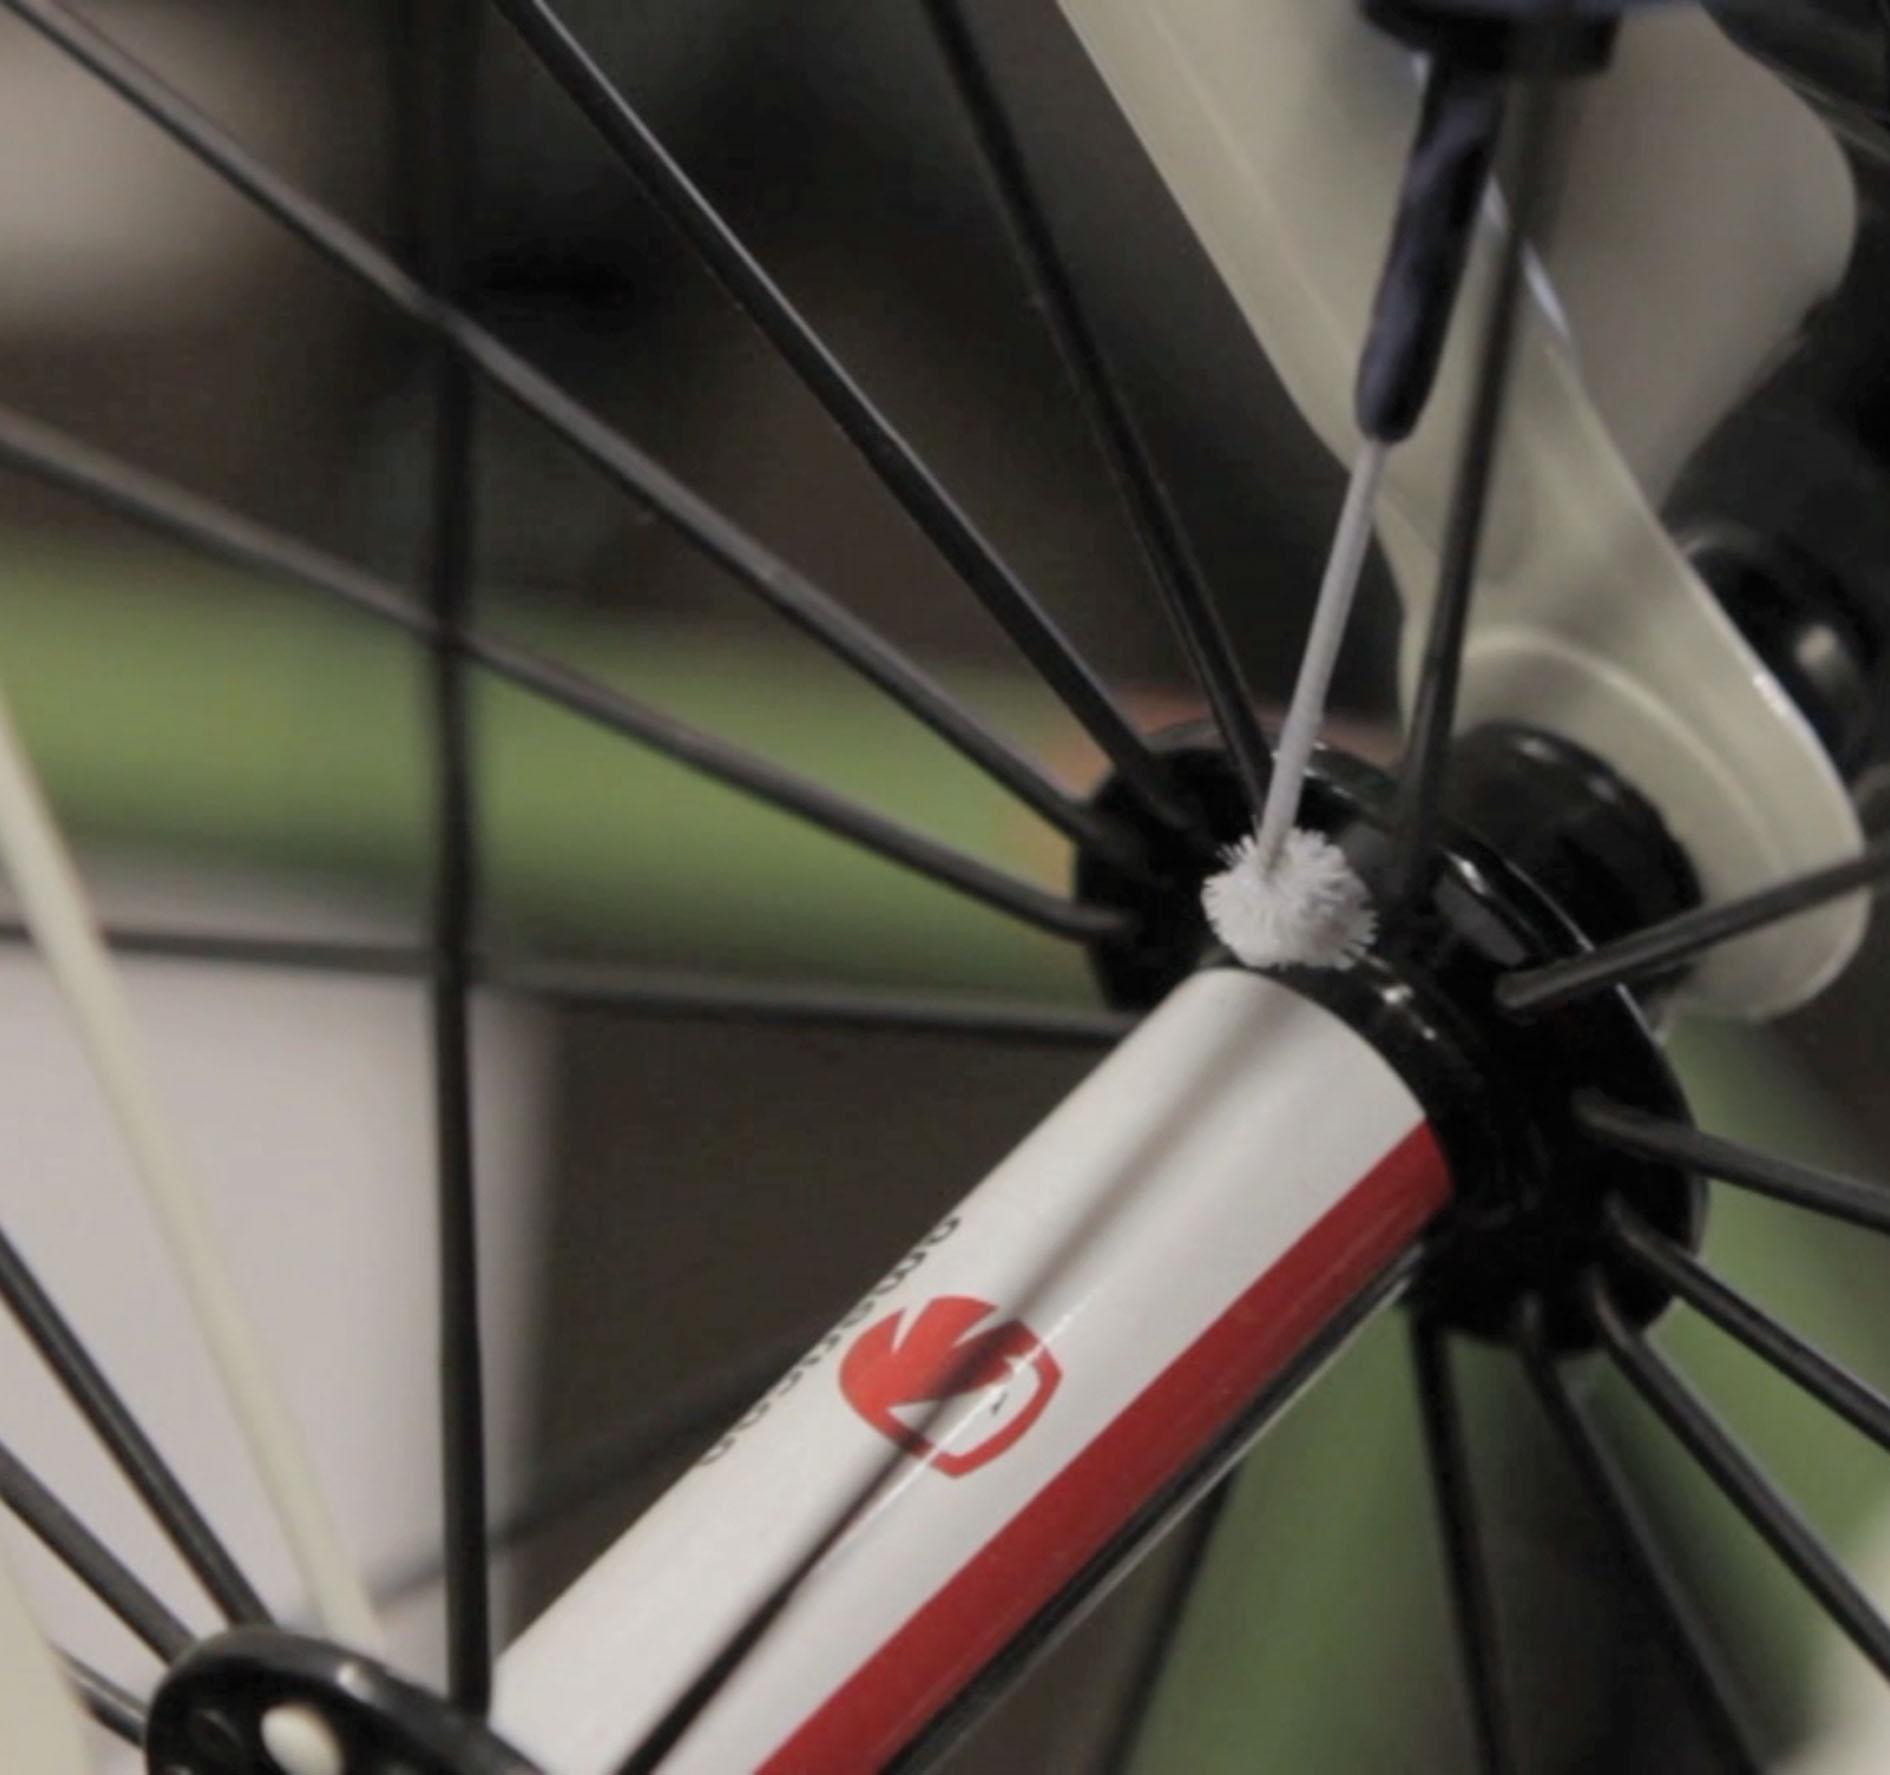 Cycle_Datadot_Application1